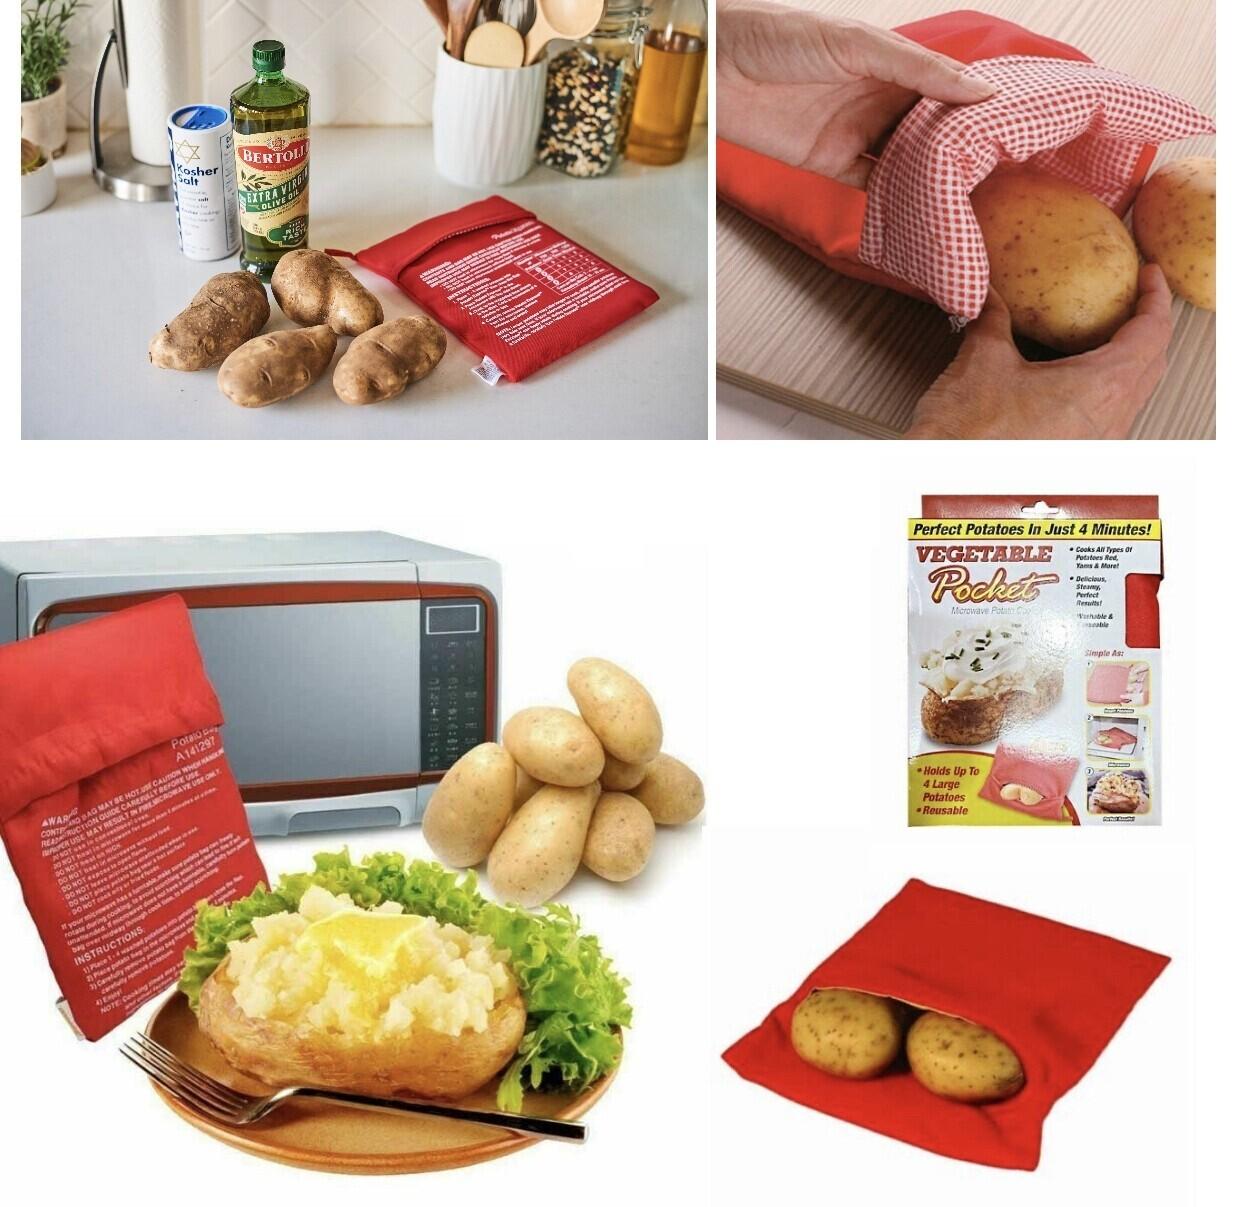 Potato Microwave Cooker